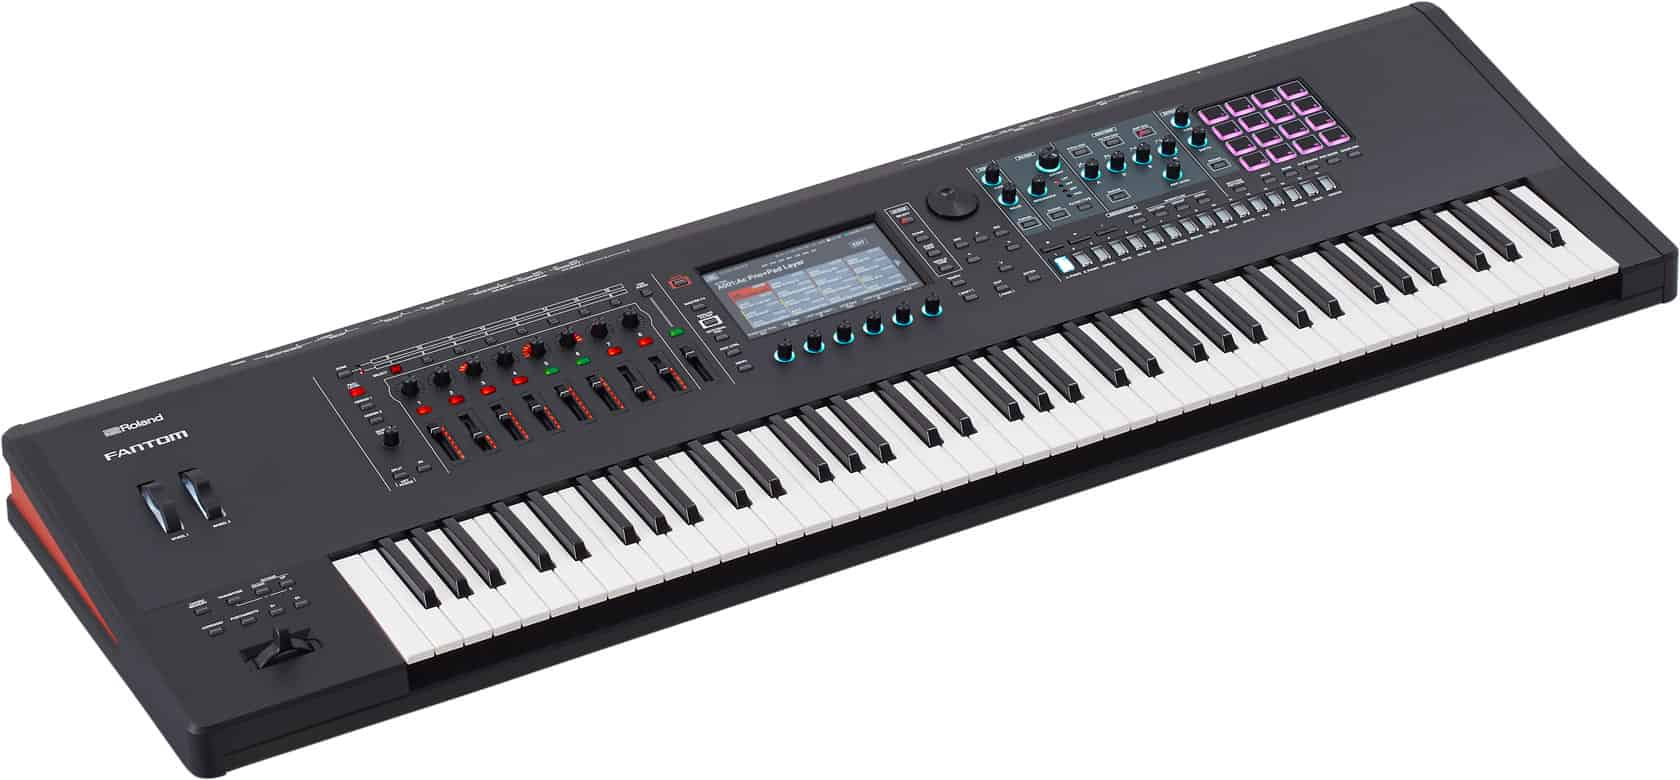 Roland FANTOM-7 Music Workstation Keyboard 3